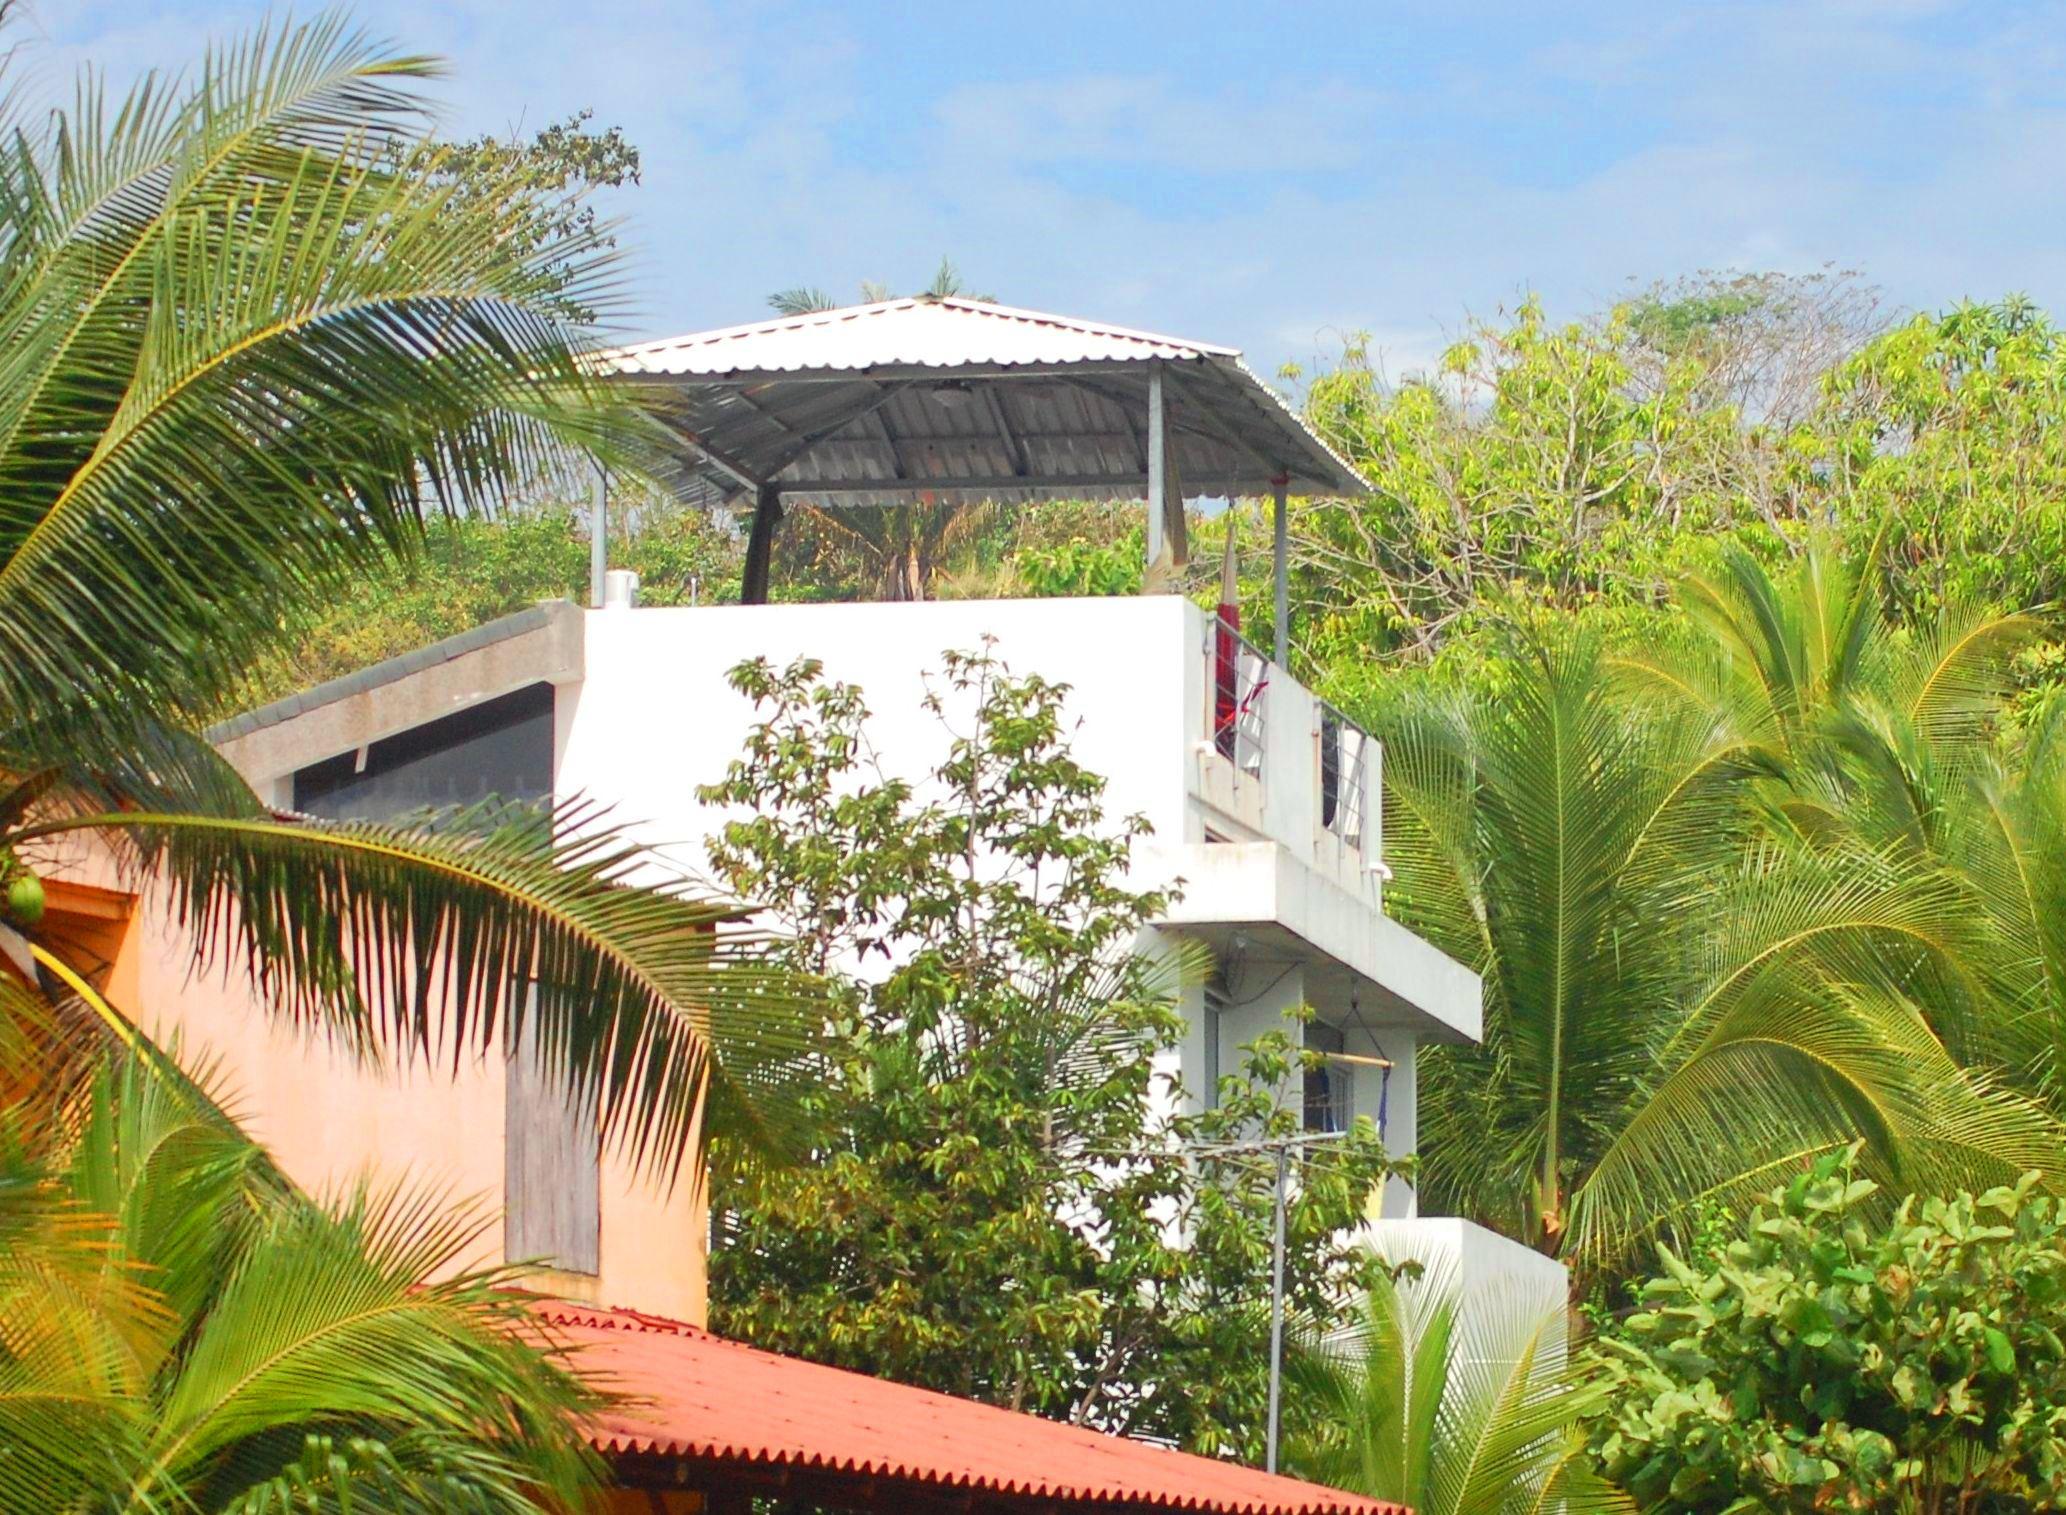 Costa-Rica-Beach-House 0112.jpg